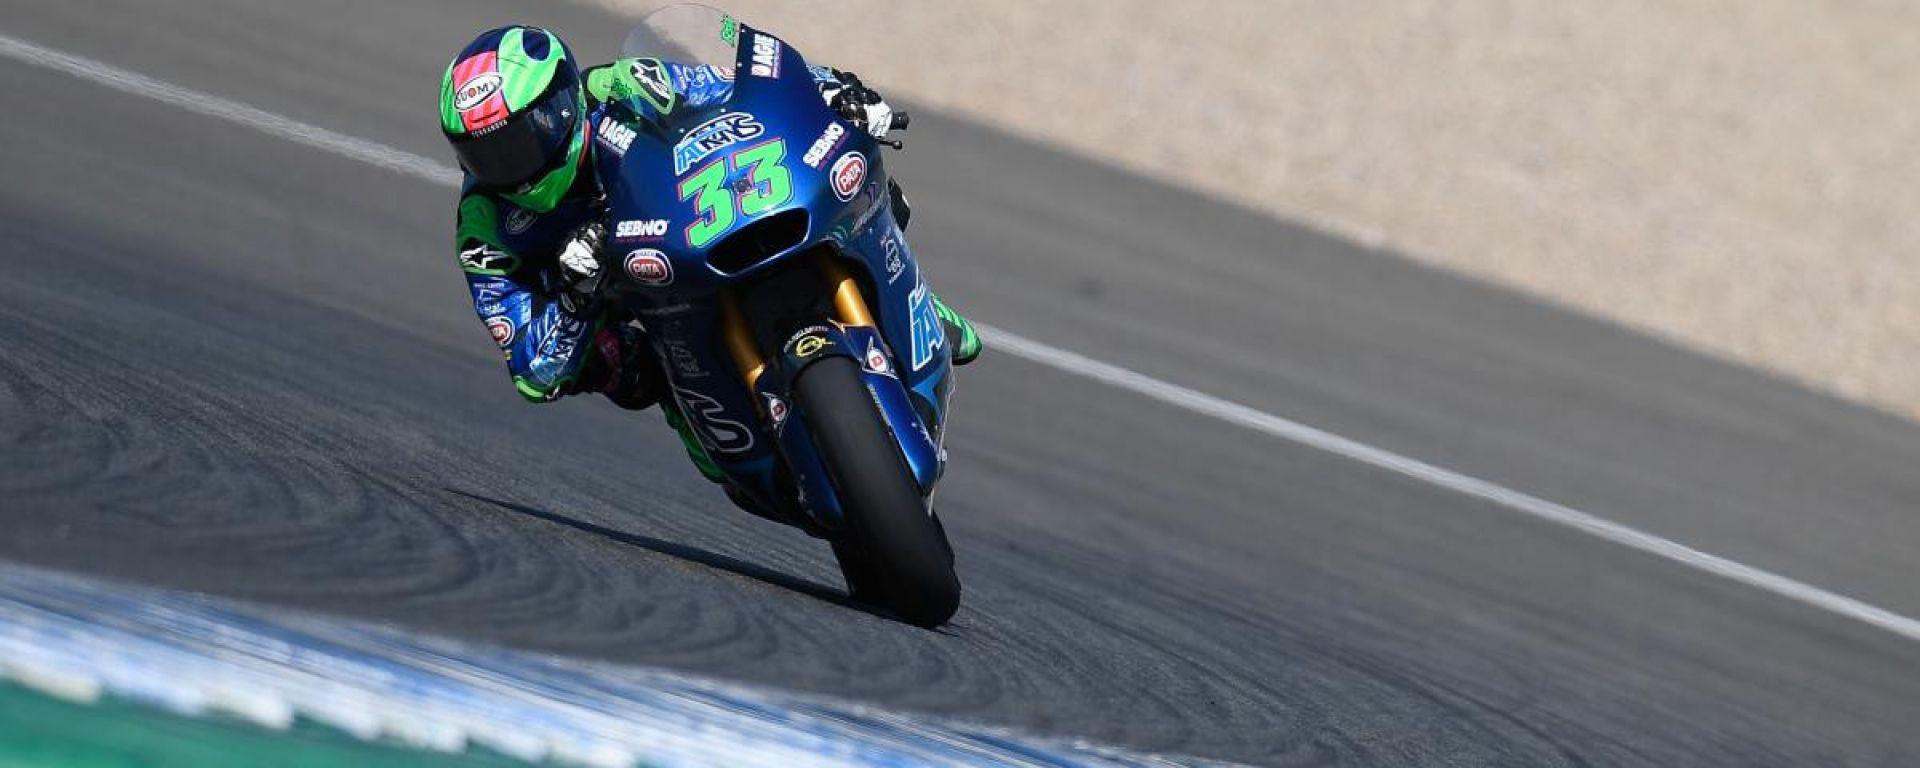 Moto2 GP Andalusia 2020, Jerez: Enea Bastianini (Team Italtrans)